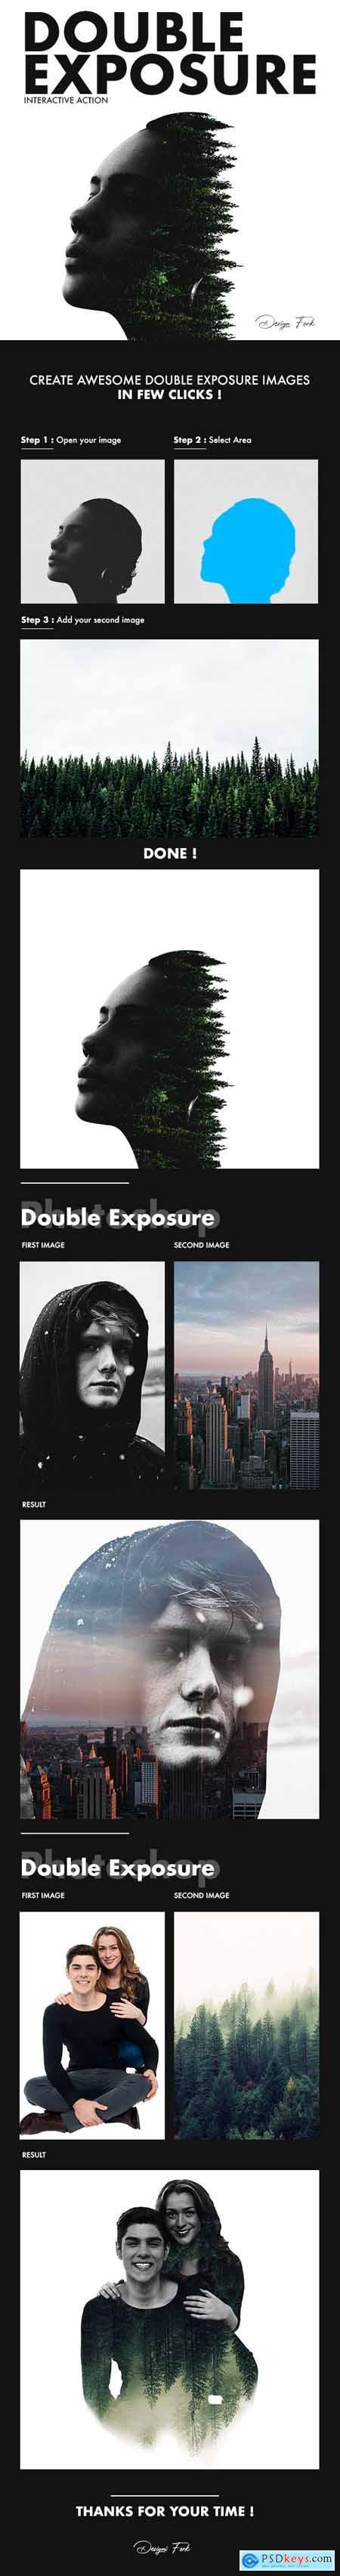 Double Exposure Photoshop Action 29211111